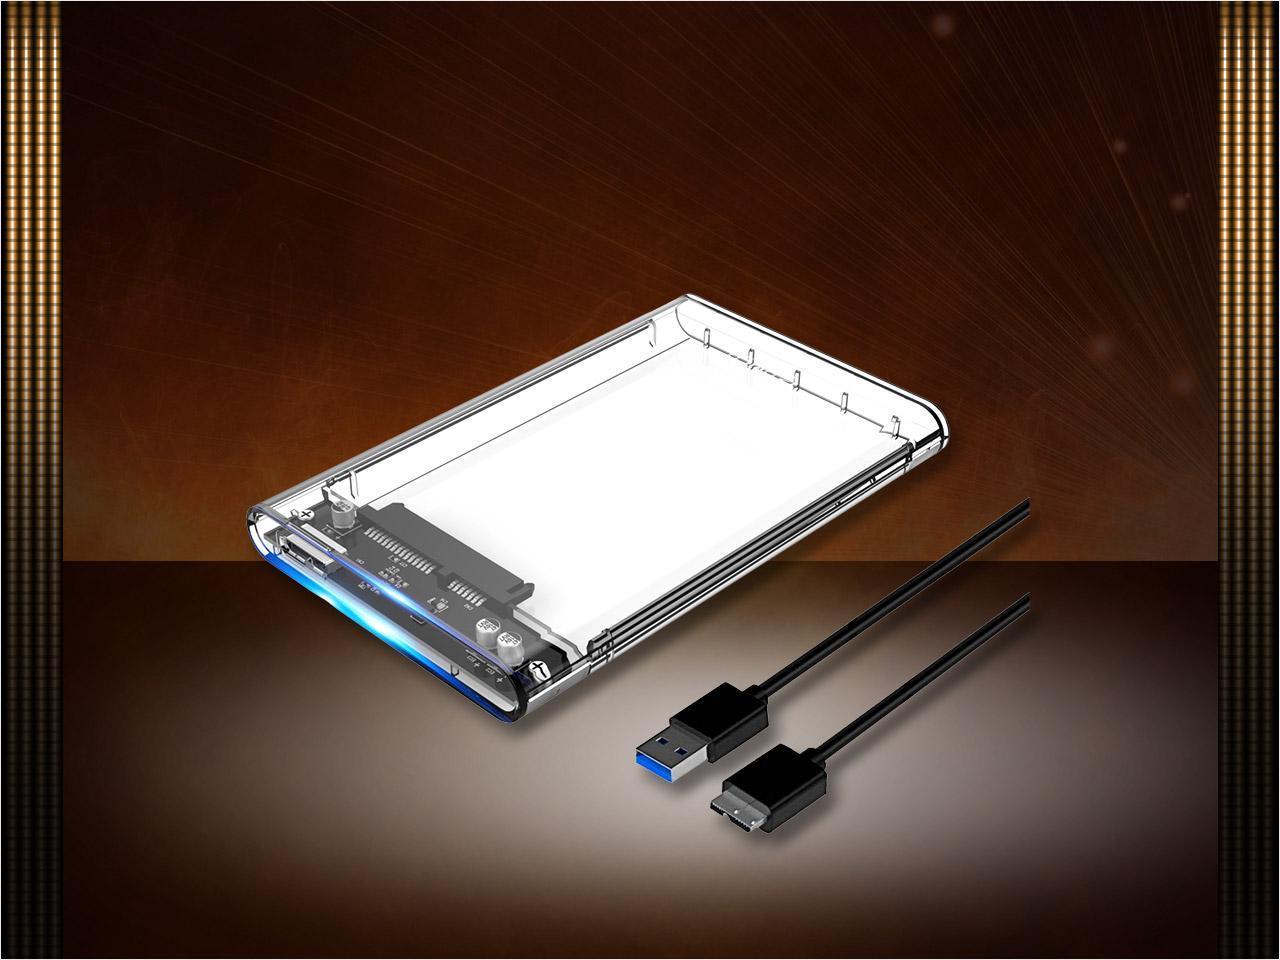 Orico Transparent Usb 30 To Sata 25 Inch External Hard Drive Tebal Hdd Caddy Disk Enclosure Box